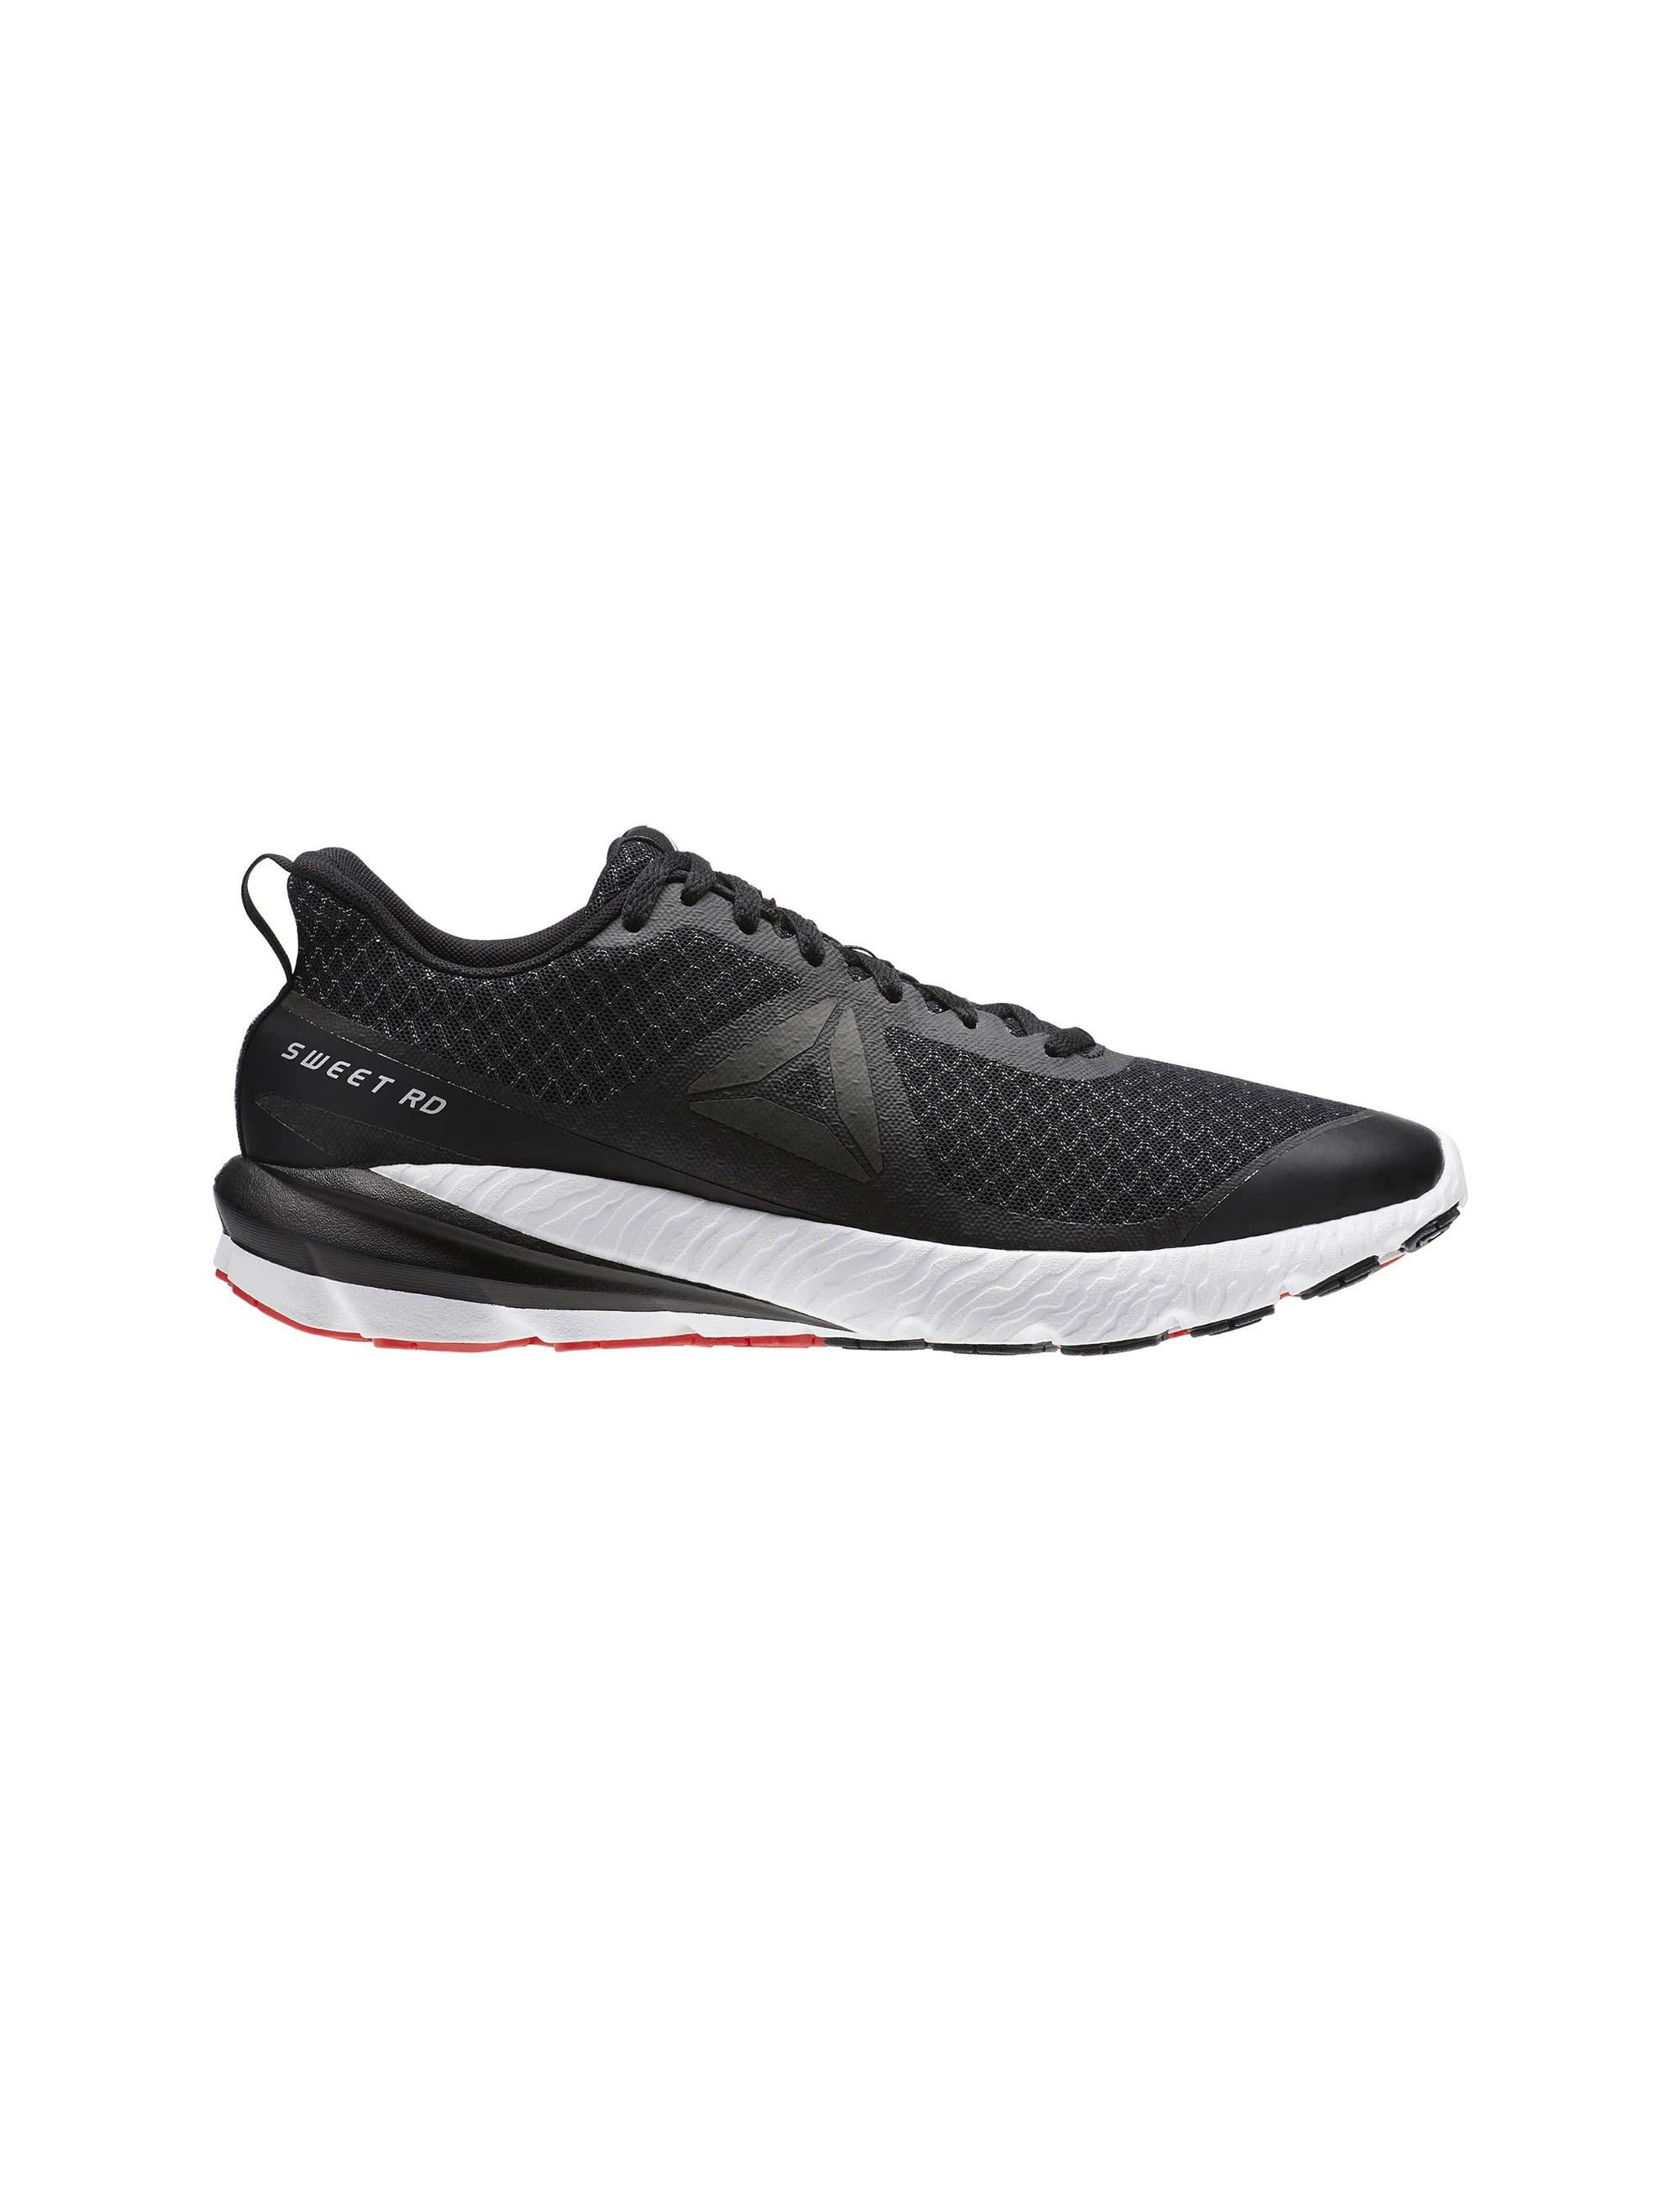 قیمت کفش دویدن بندی مردانه OSR Sweet Road SE - ریباک